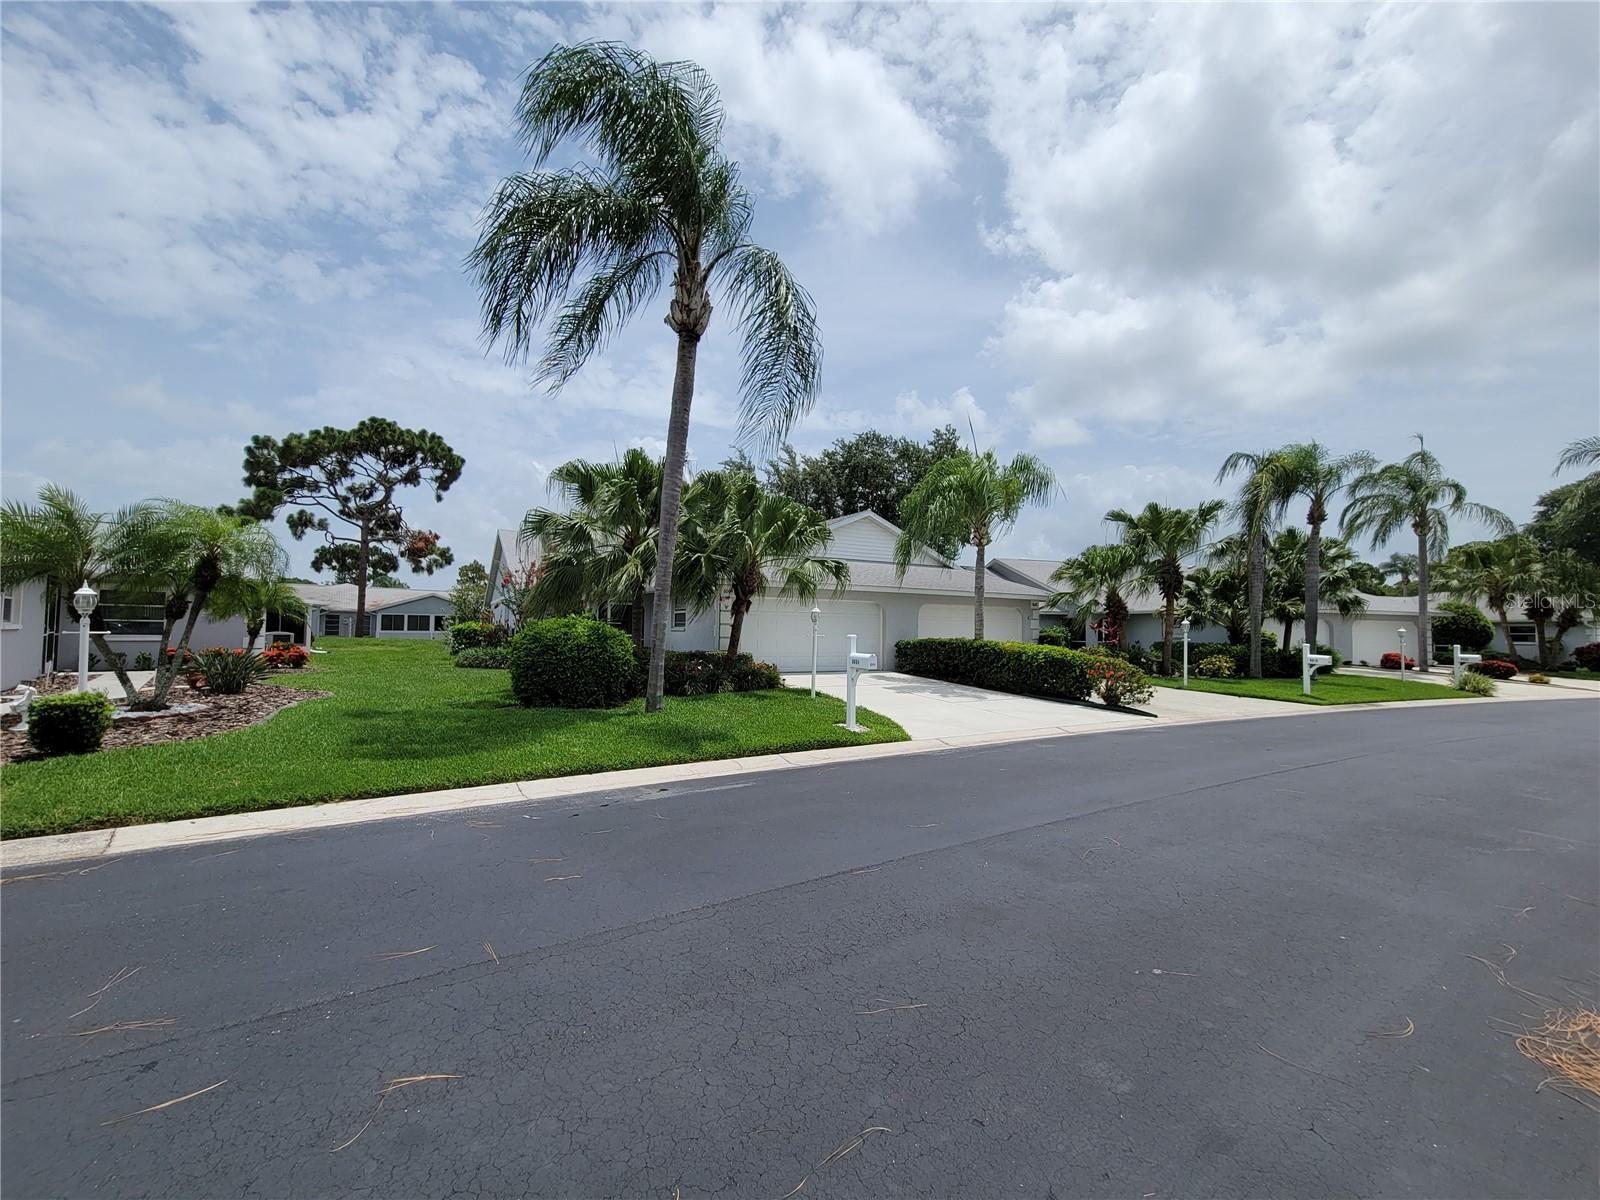 Photo of 6004 BONAVENTURE PLACE, SARASOTA, FL 34243 (MLS # A4504632)